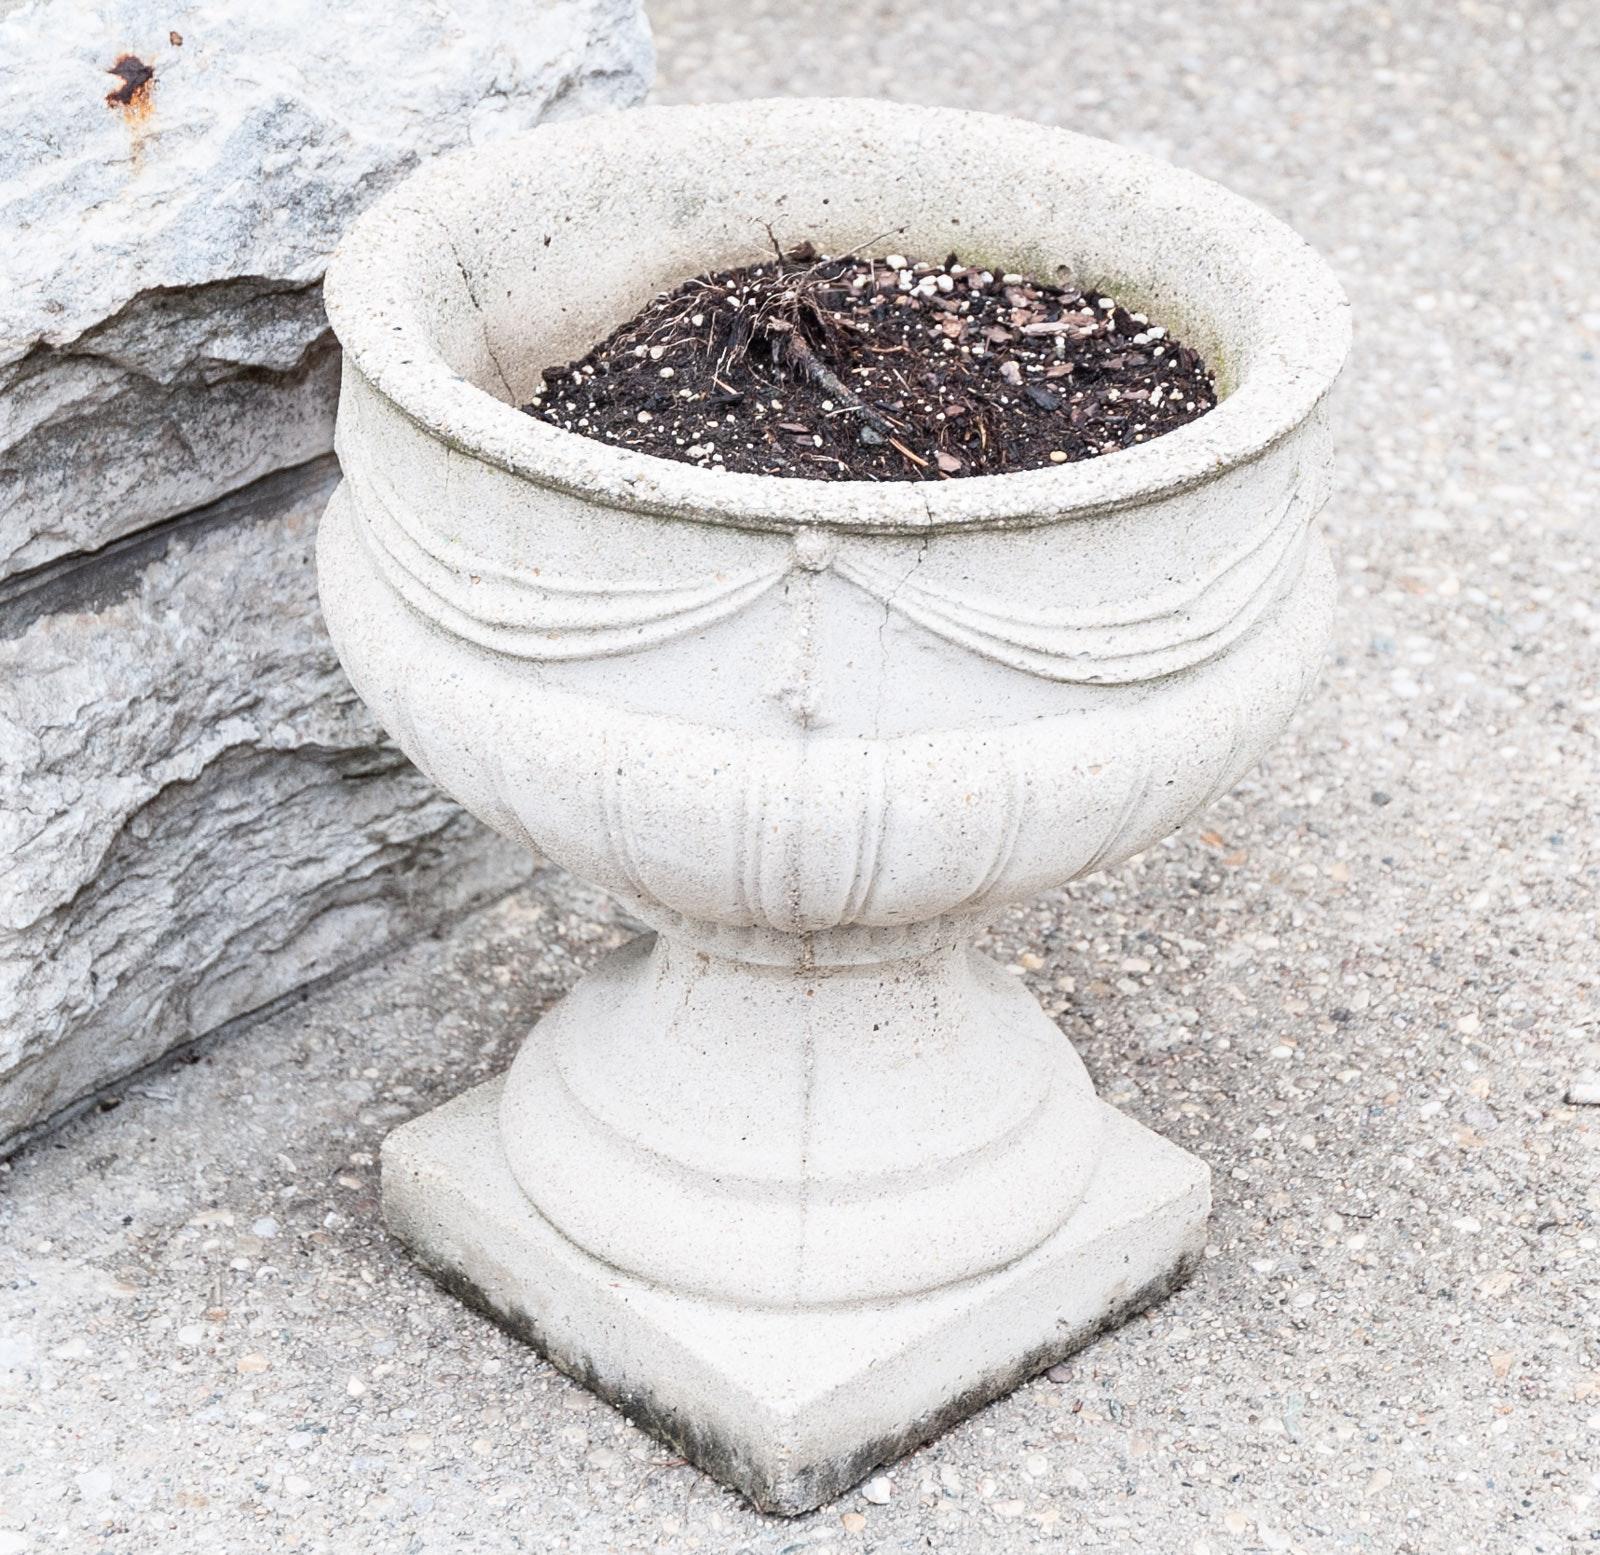 Classically Draped Concrete Planters Set